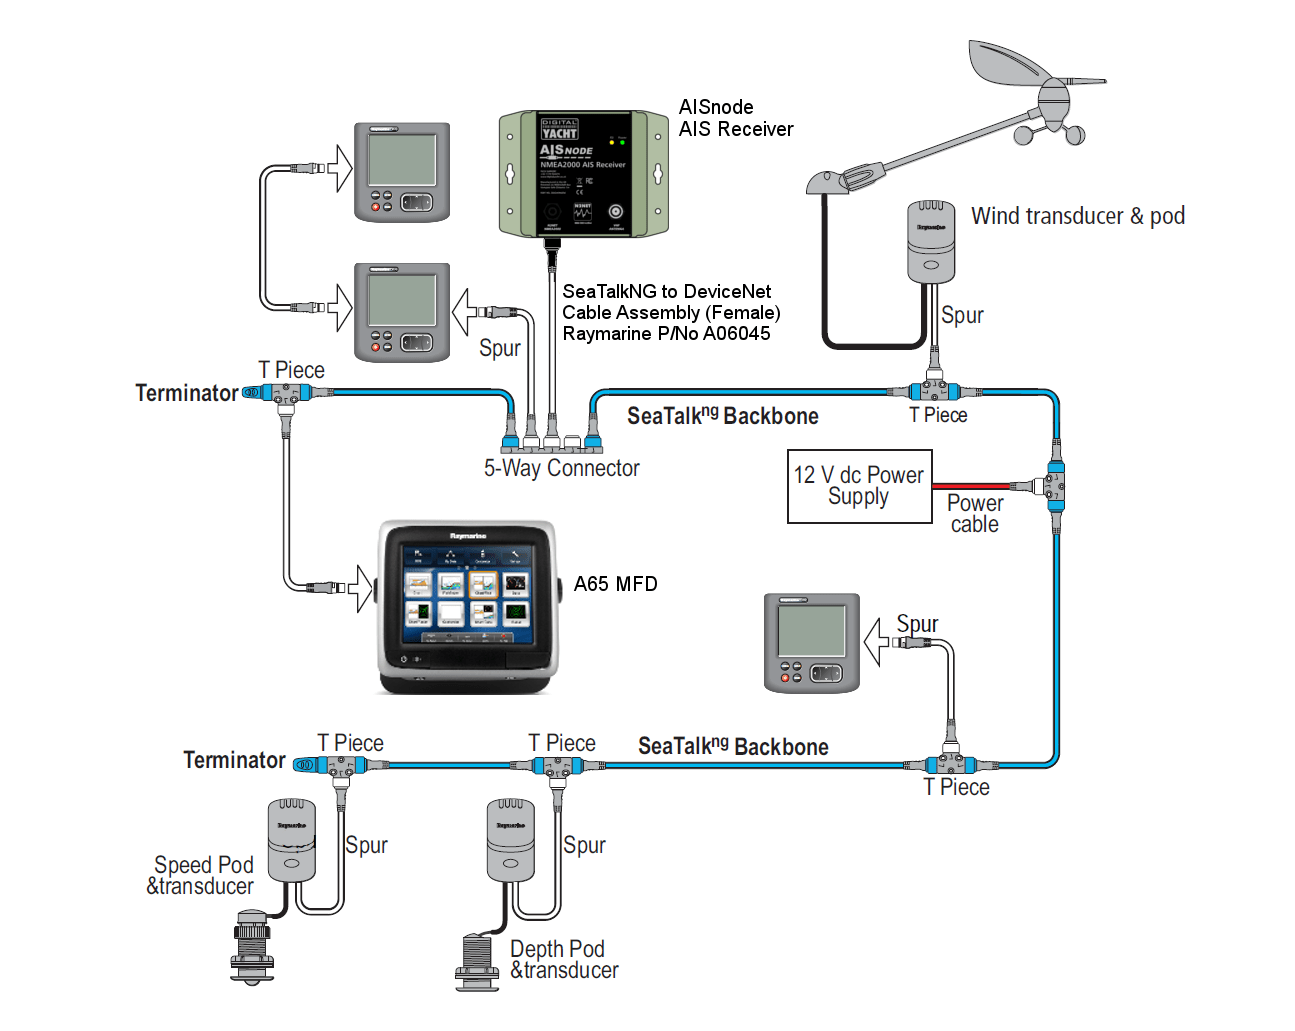 raymarine 125 gps antenna wiring diagram schematics wiring diagrams u2022 rh seniorlivinguniversity co Boat Wiring Schematics raymarine e125 gps wiring diagram